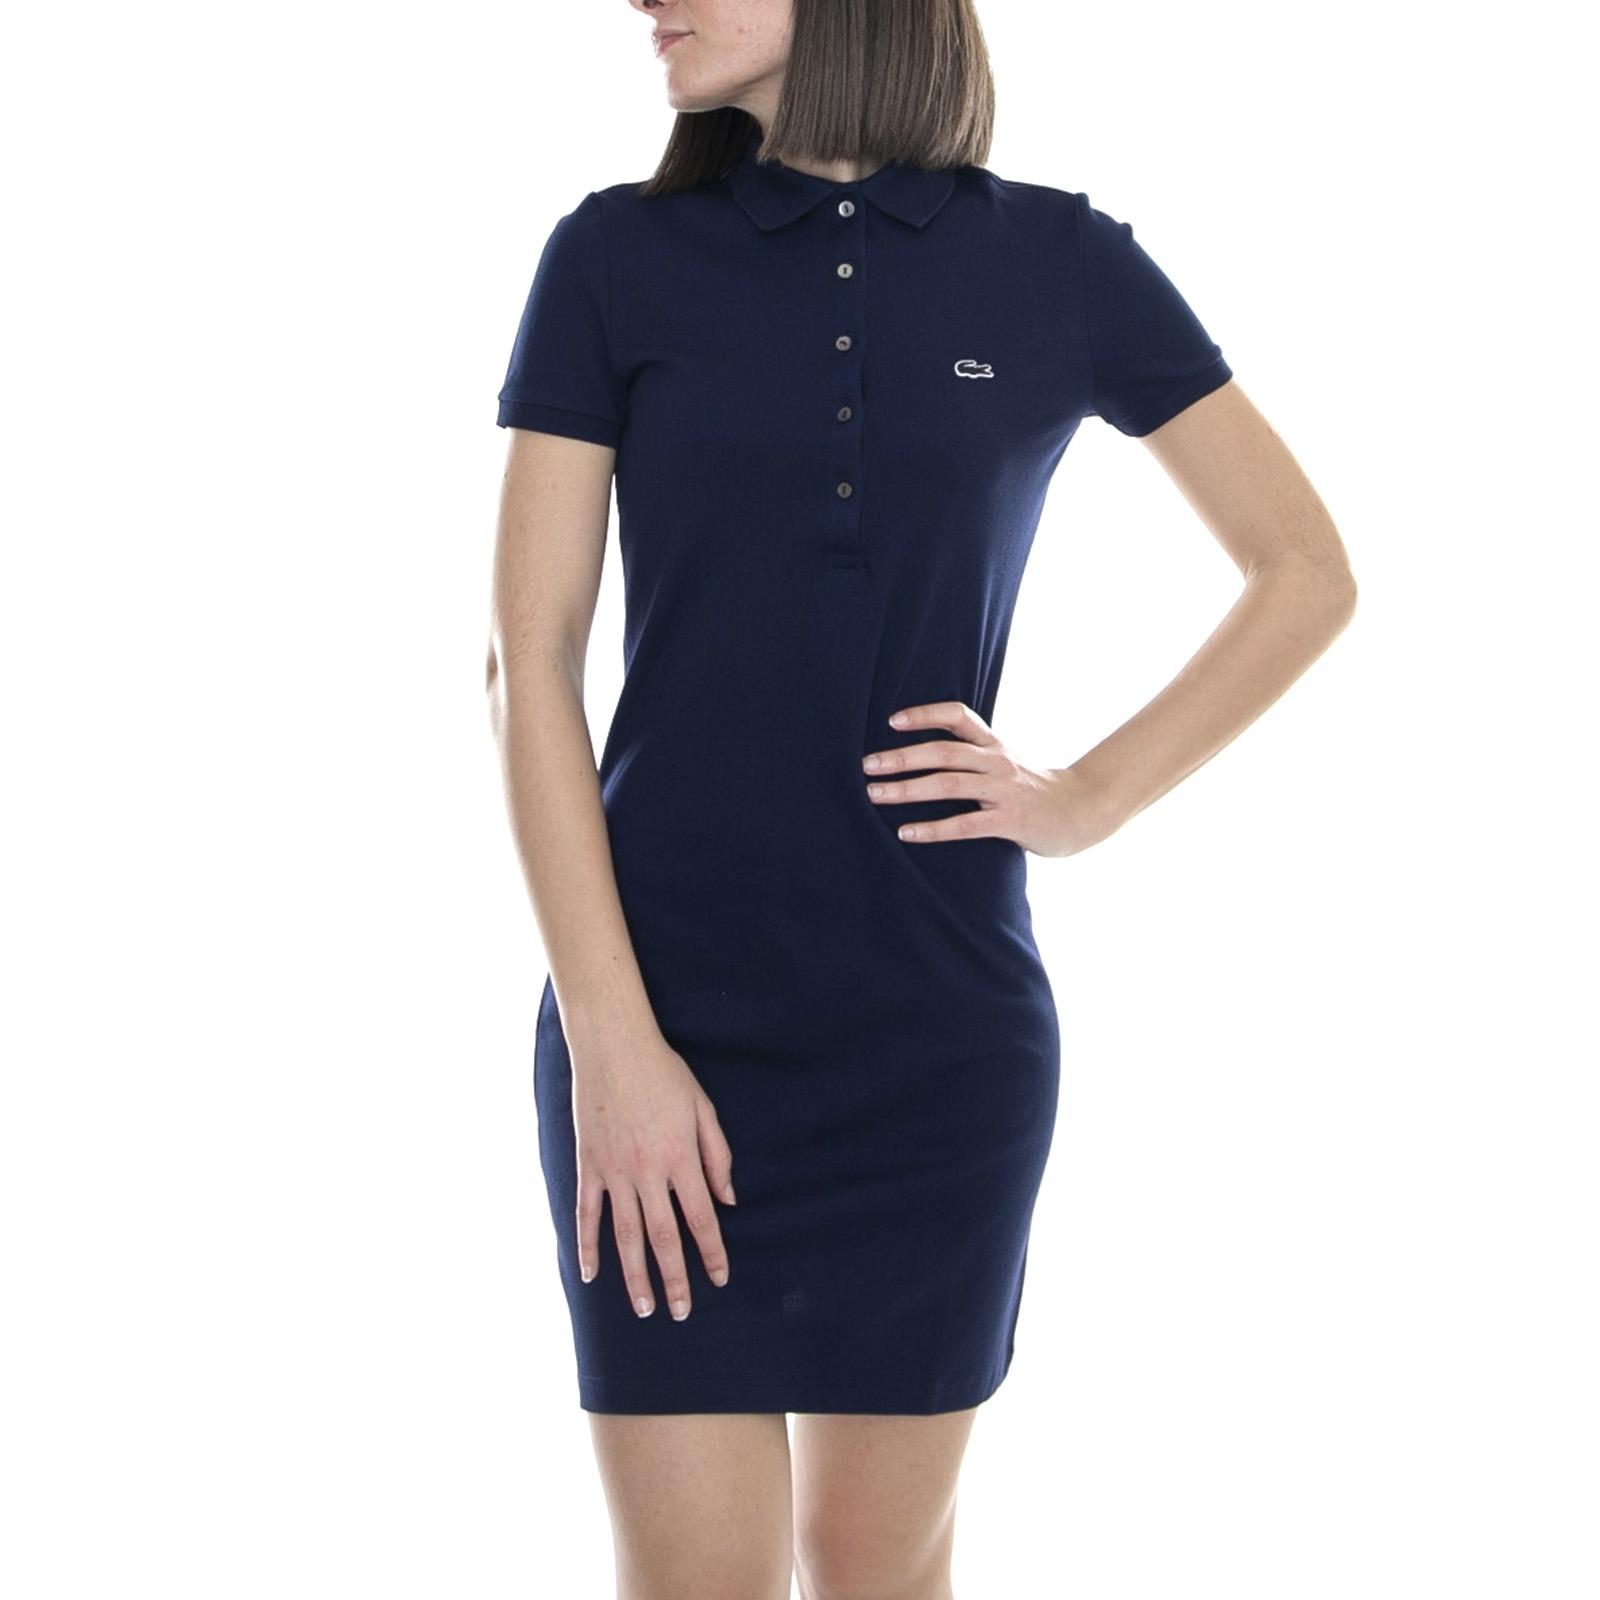 Bleu Vêtements Marine Lacoste Femme Polo Robe Costume MVqpSUz